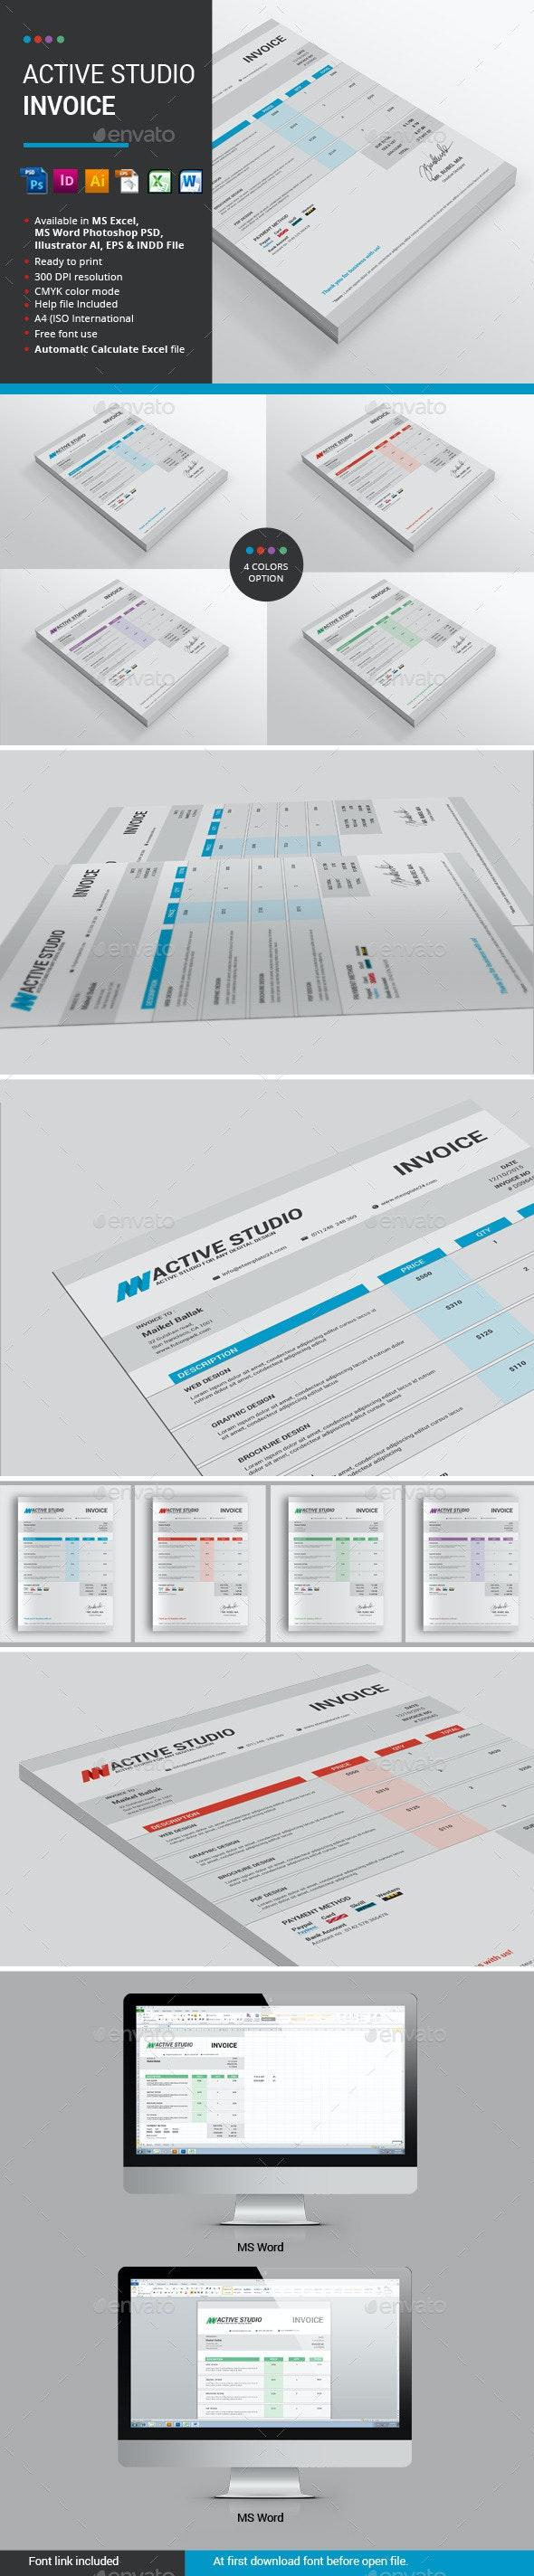 Active Studio Invoice - Proposals & Invoices Stationery